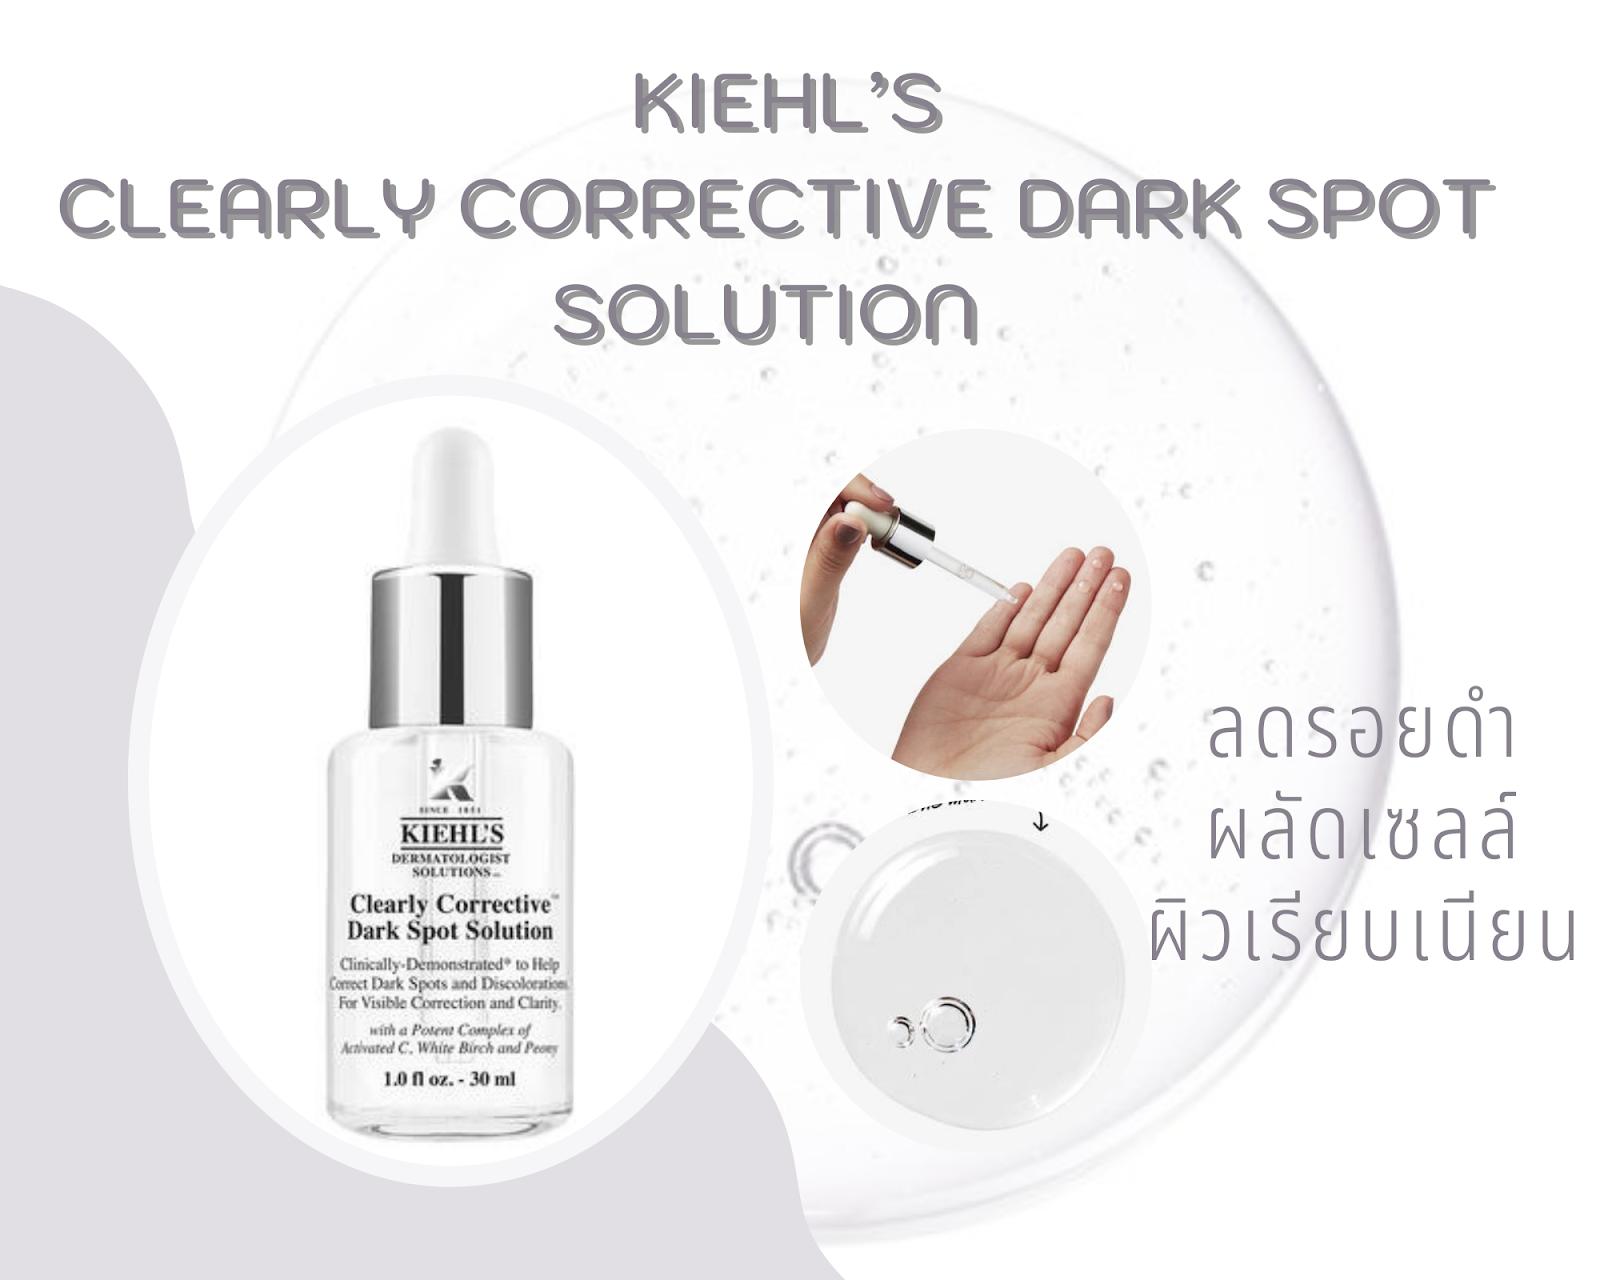 8. KIEHL'S Clearly Corrective Dark Spot Solution